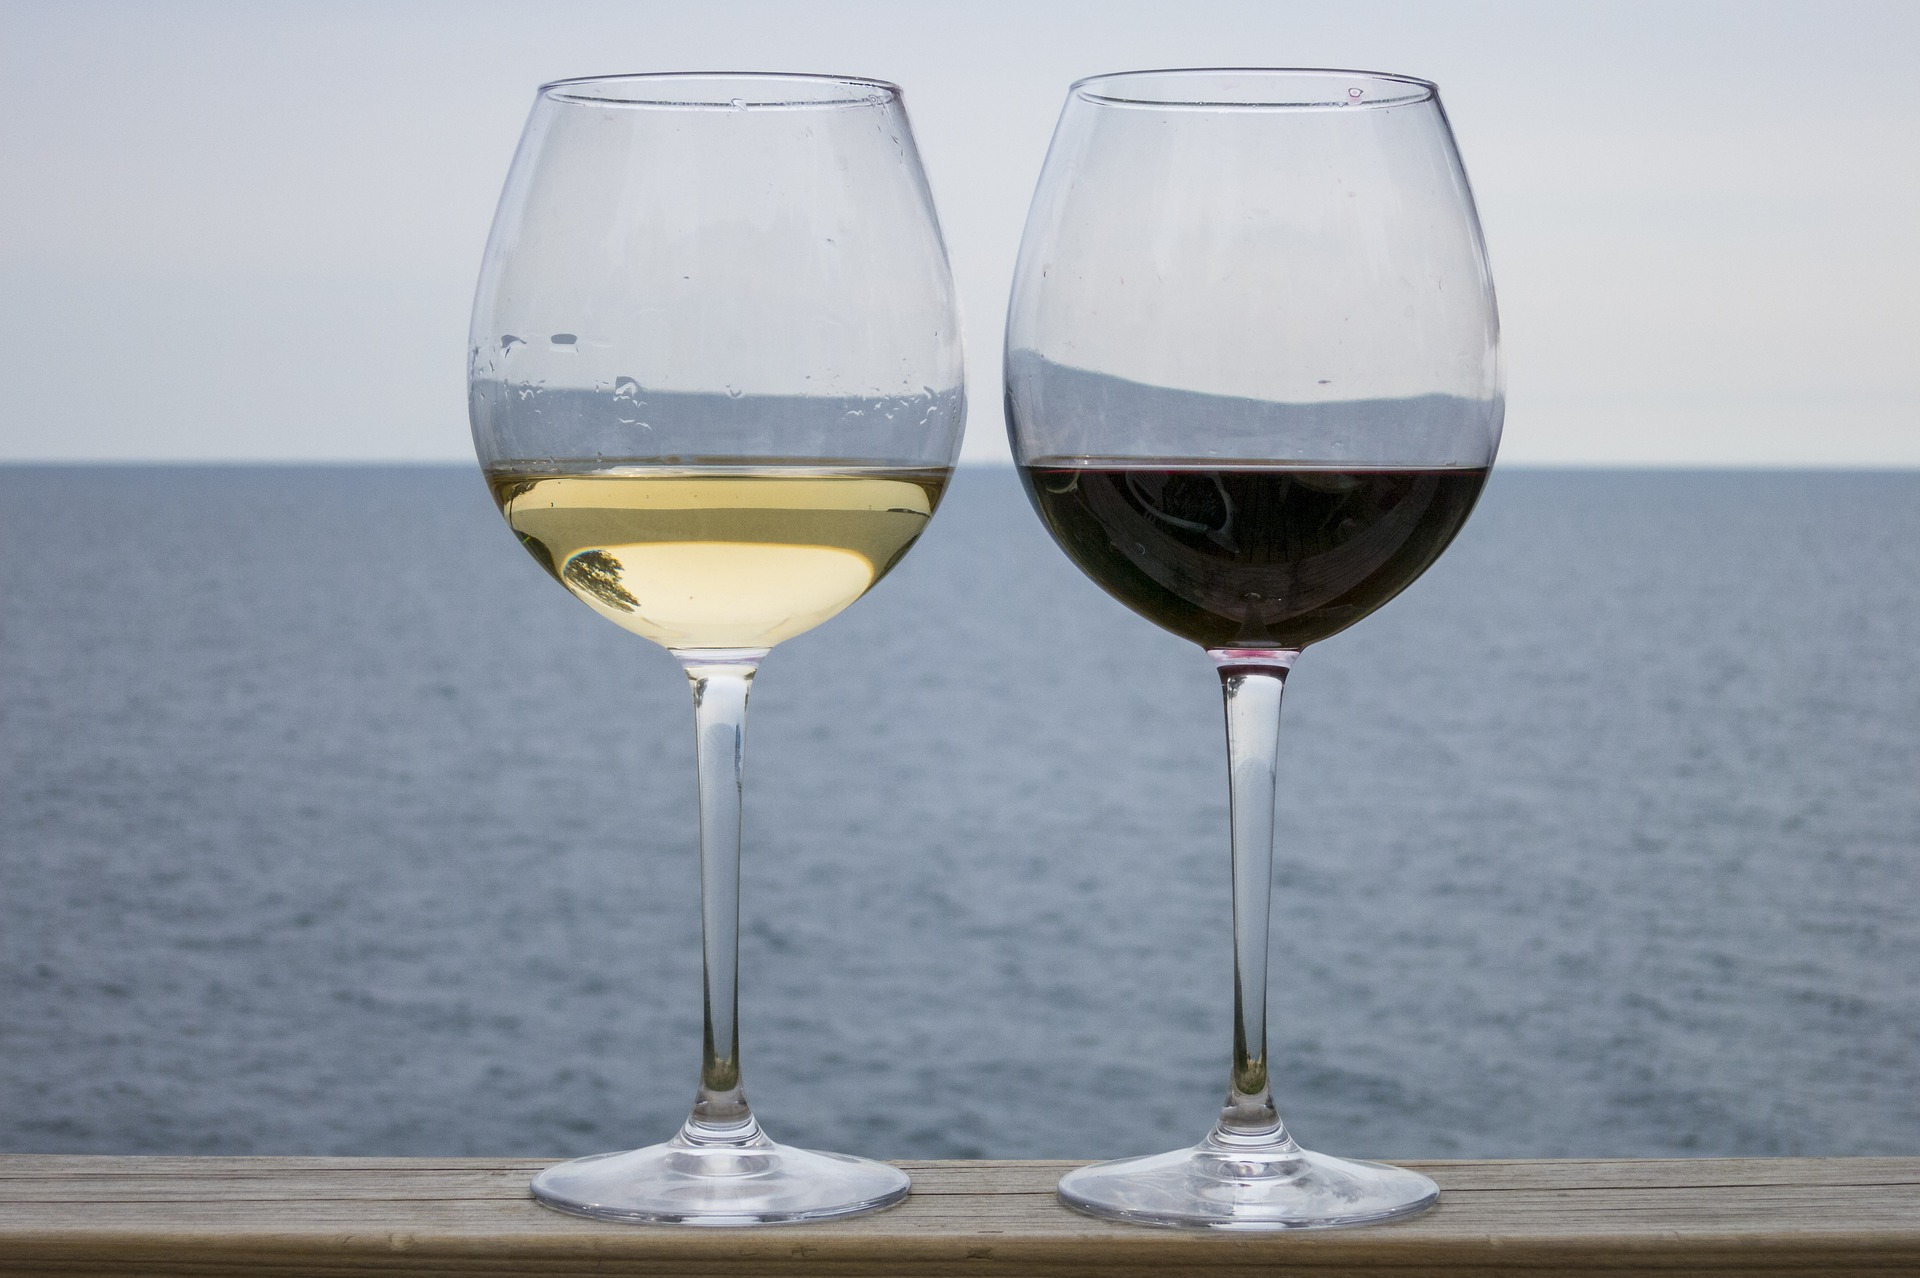 wine-1585337_1920.jpg